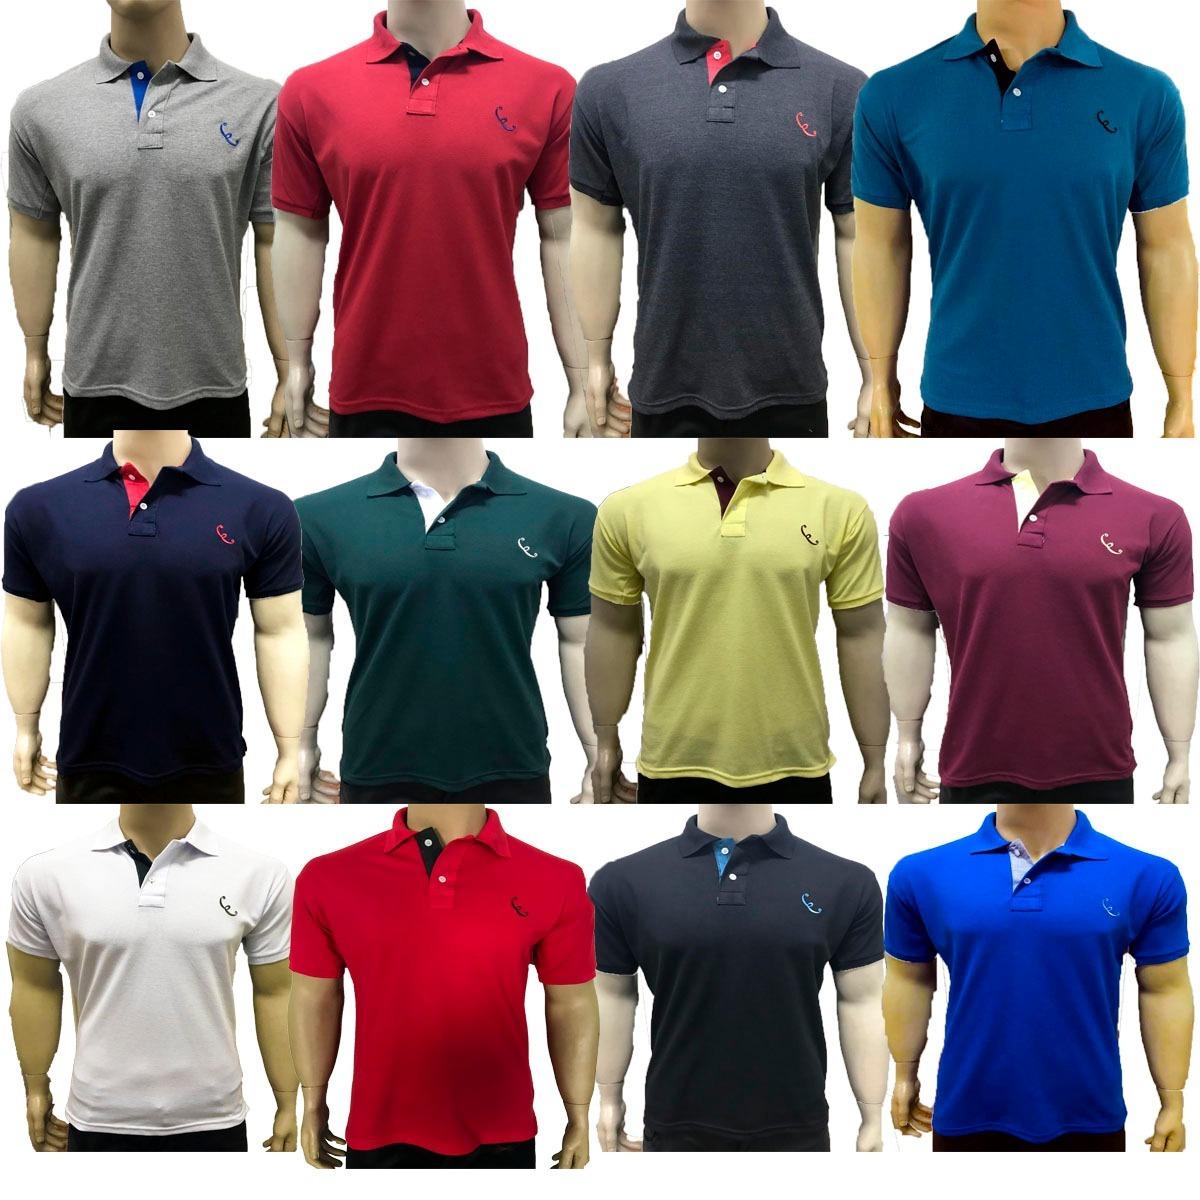 kit 10 camisas gola polo micro logos atacado revenda lucre. Carregando zoom. 3b9defb7e3a32